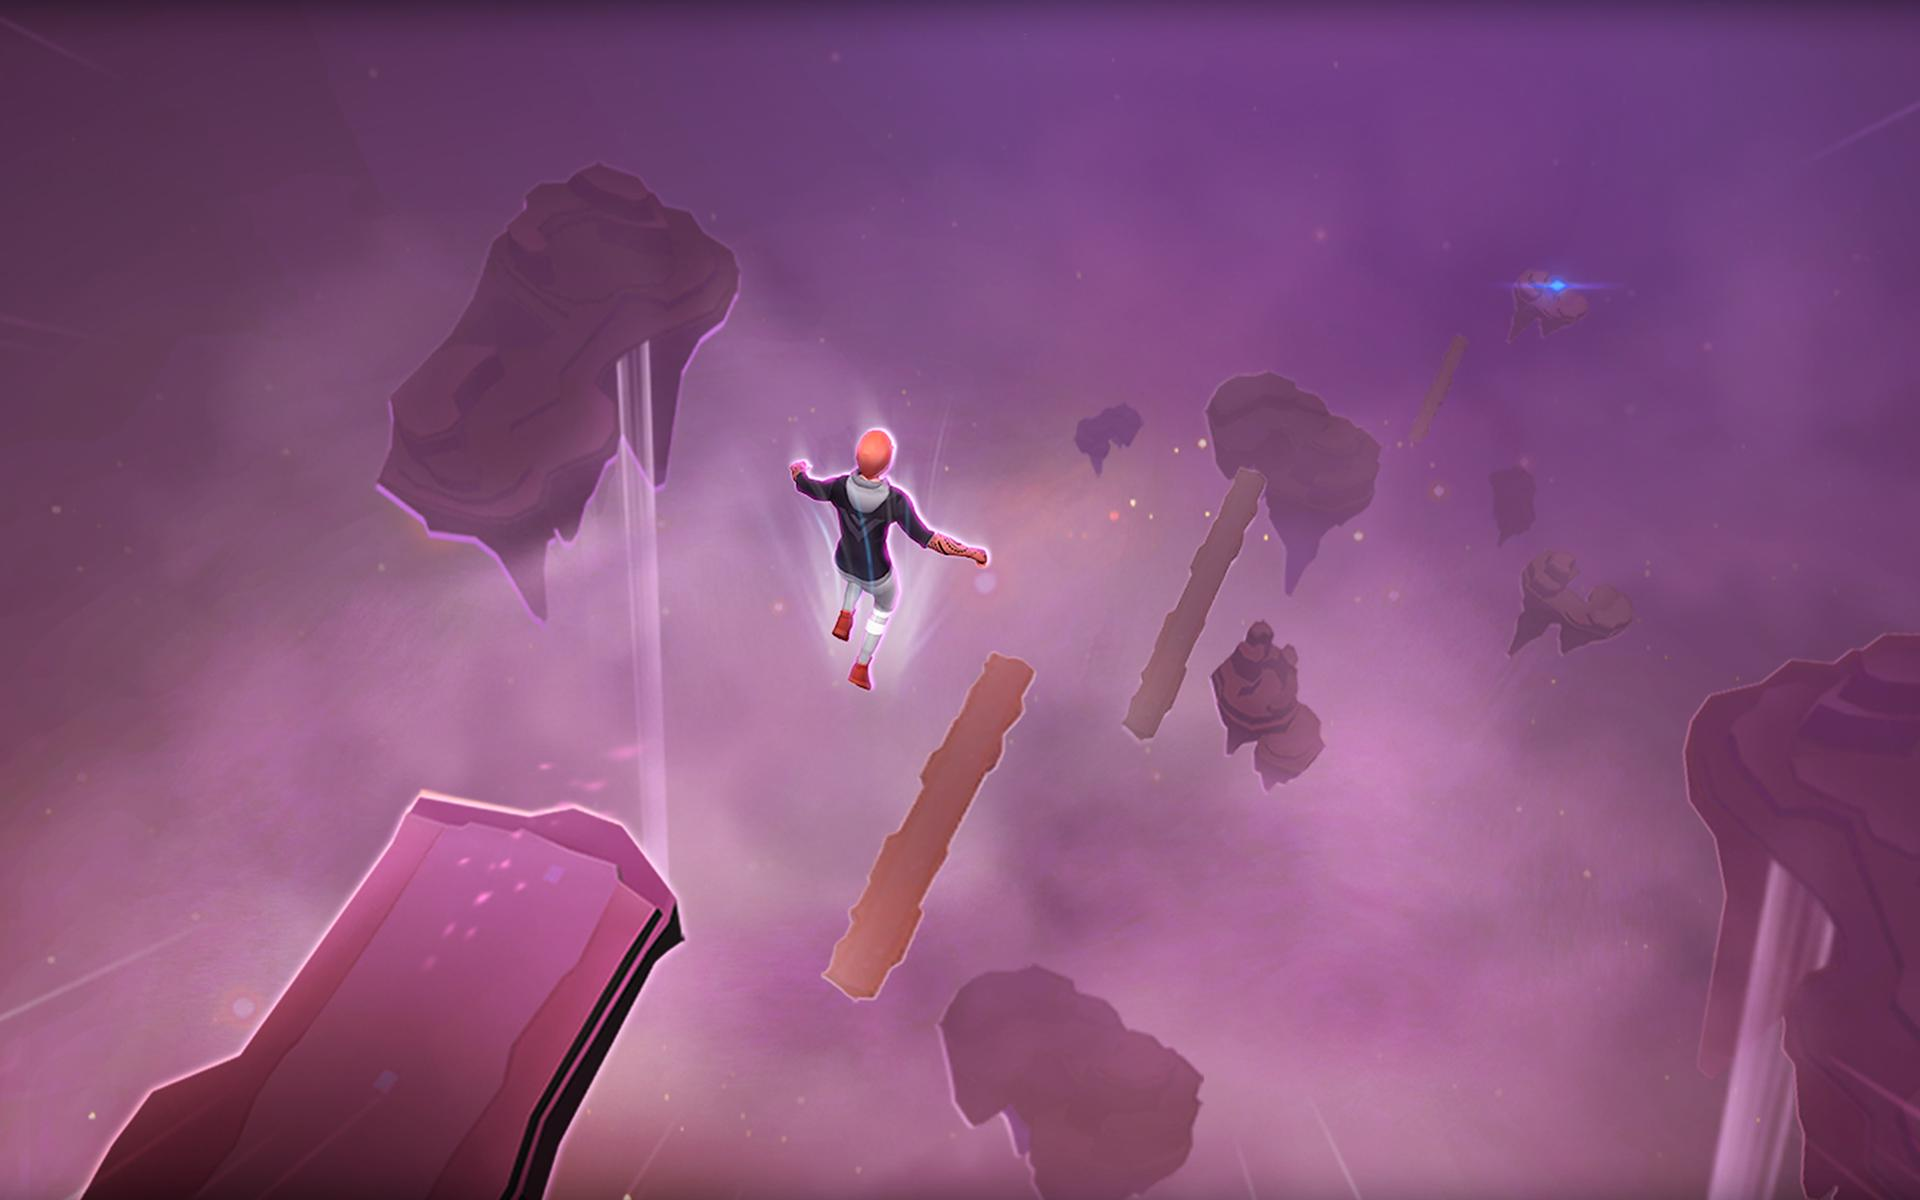 Sky Dancer Run - Running Game 4.2.0 Screenshot 21